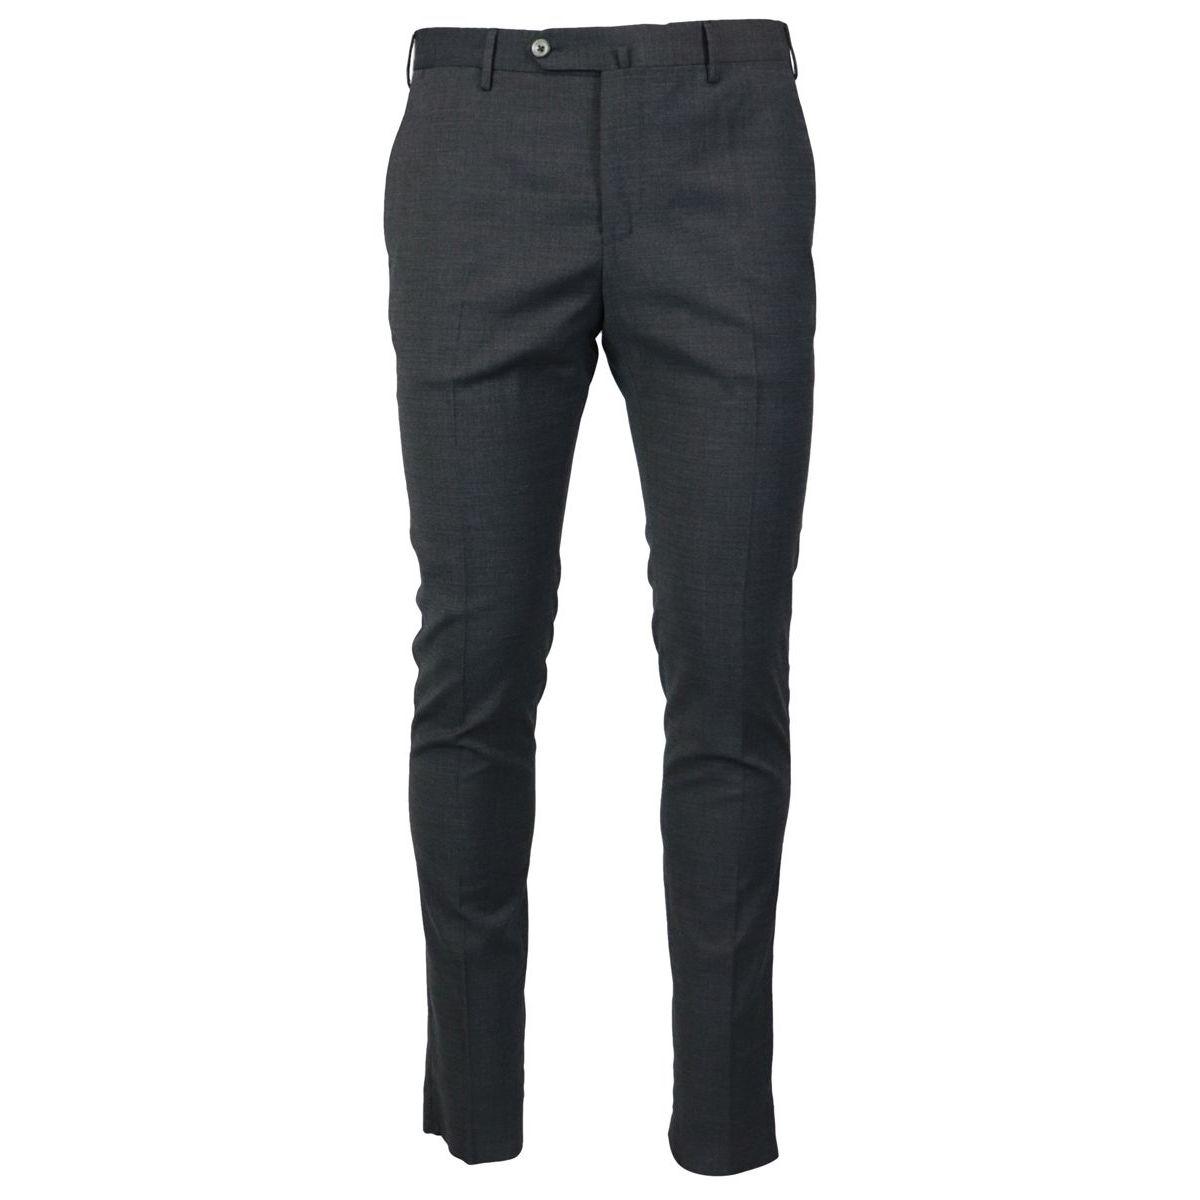 Traveler skinny fit trousers in wool blend Dark gray PT TORINO